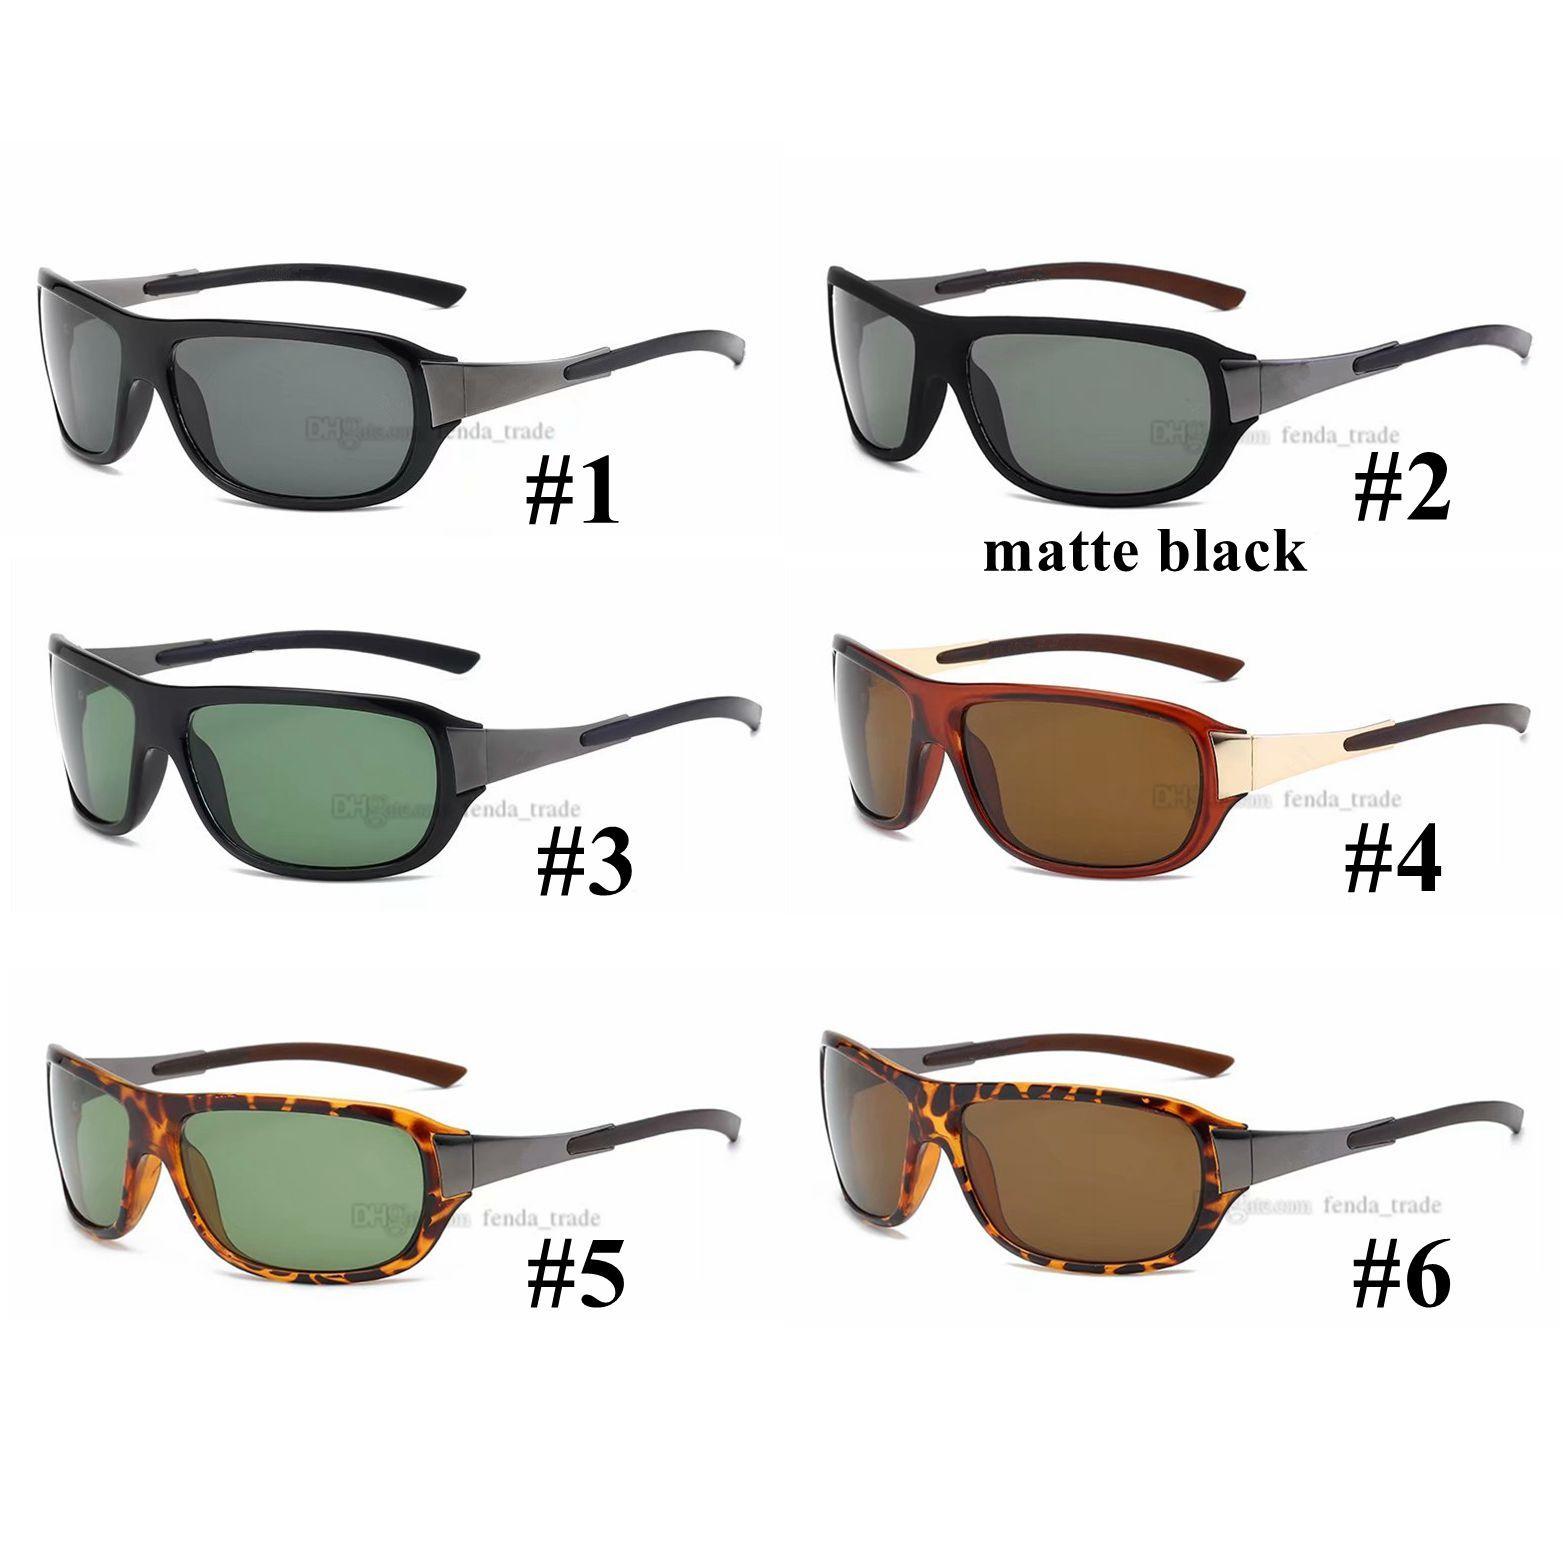 NEW Summer Street Sports Sunglasses Men's Driving Shades Male Sun Glasses For Men Retro Cheap HOT 4120 Glass lens Designer Gafas De sol 10PC